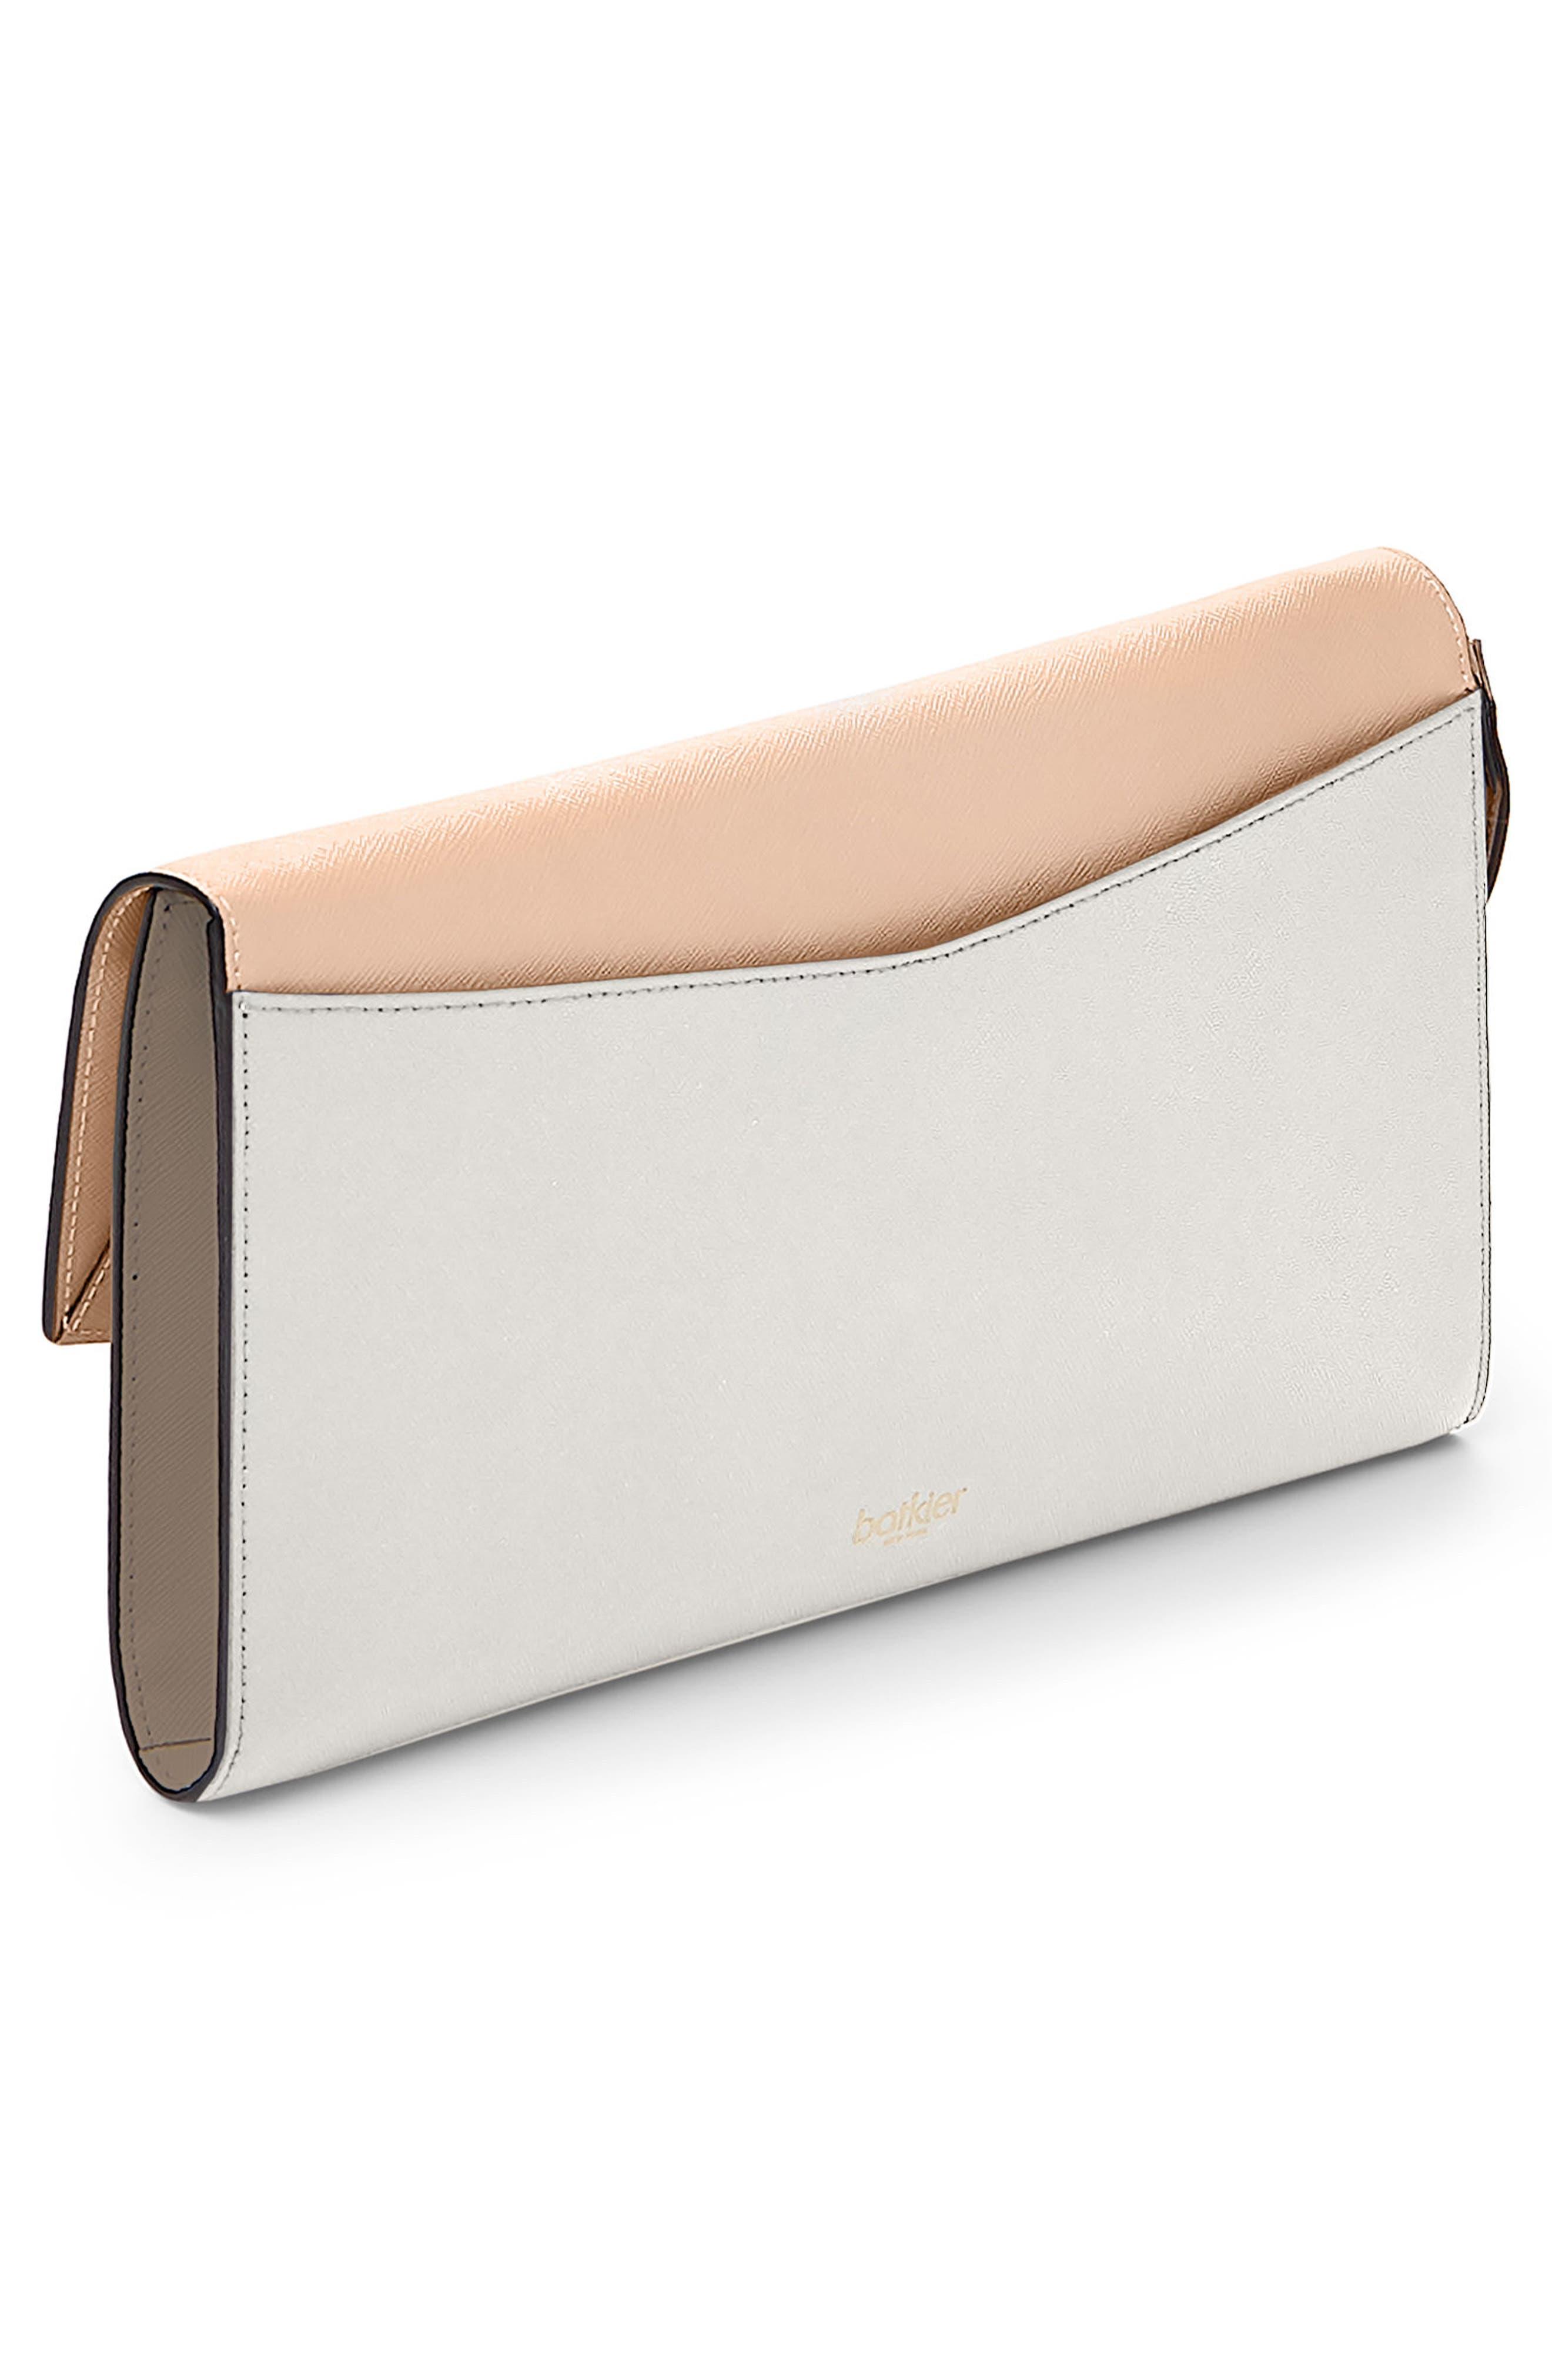 Cobble Hill Leather Wallet,                             Alternate thumbnail 3, color,                             Peach Colorblock